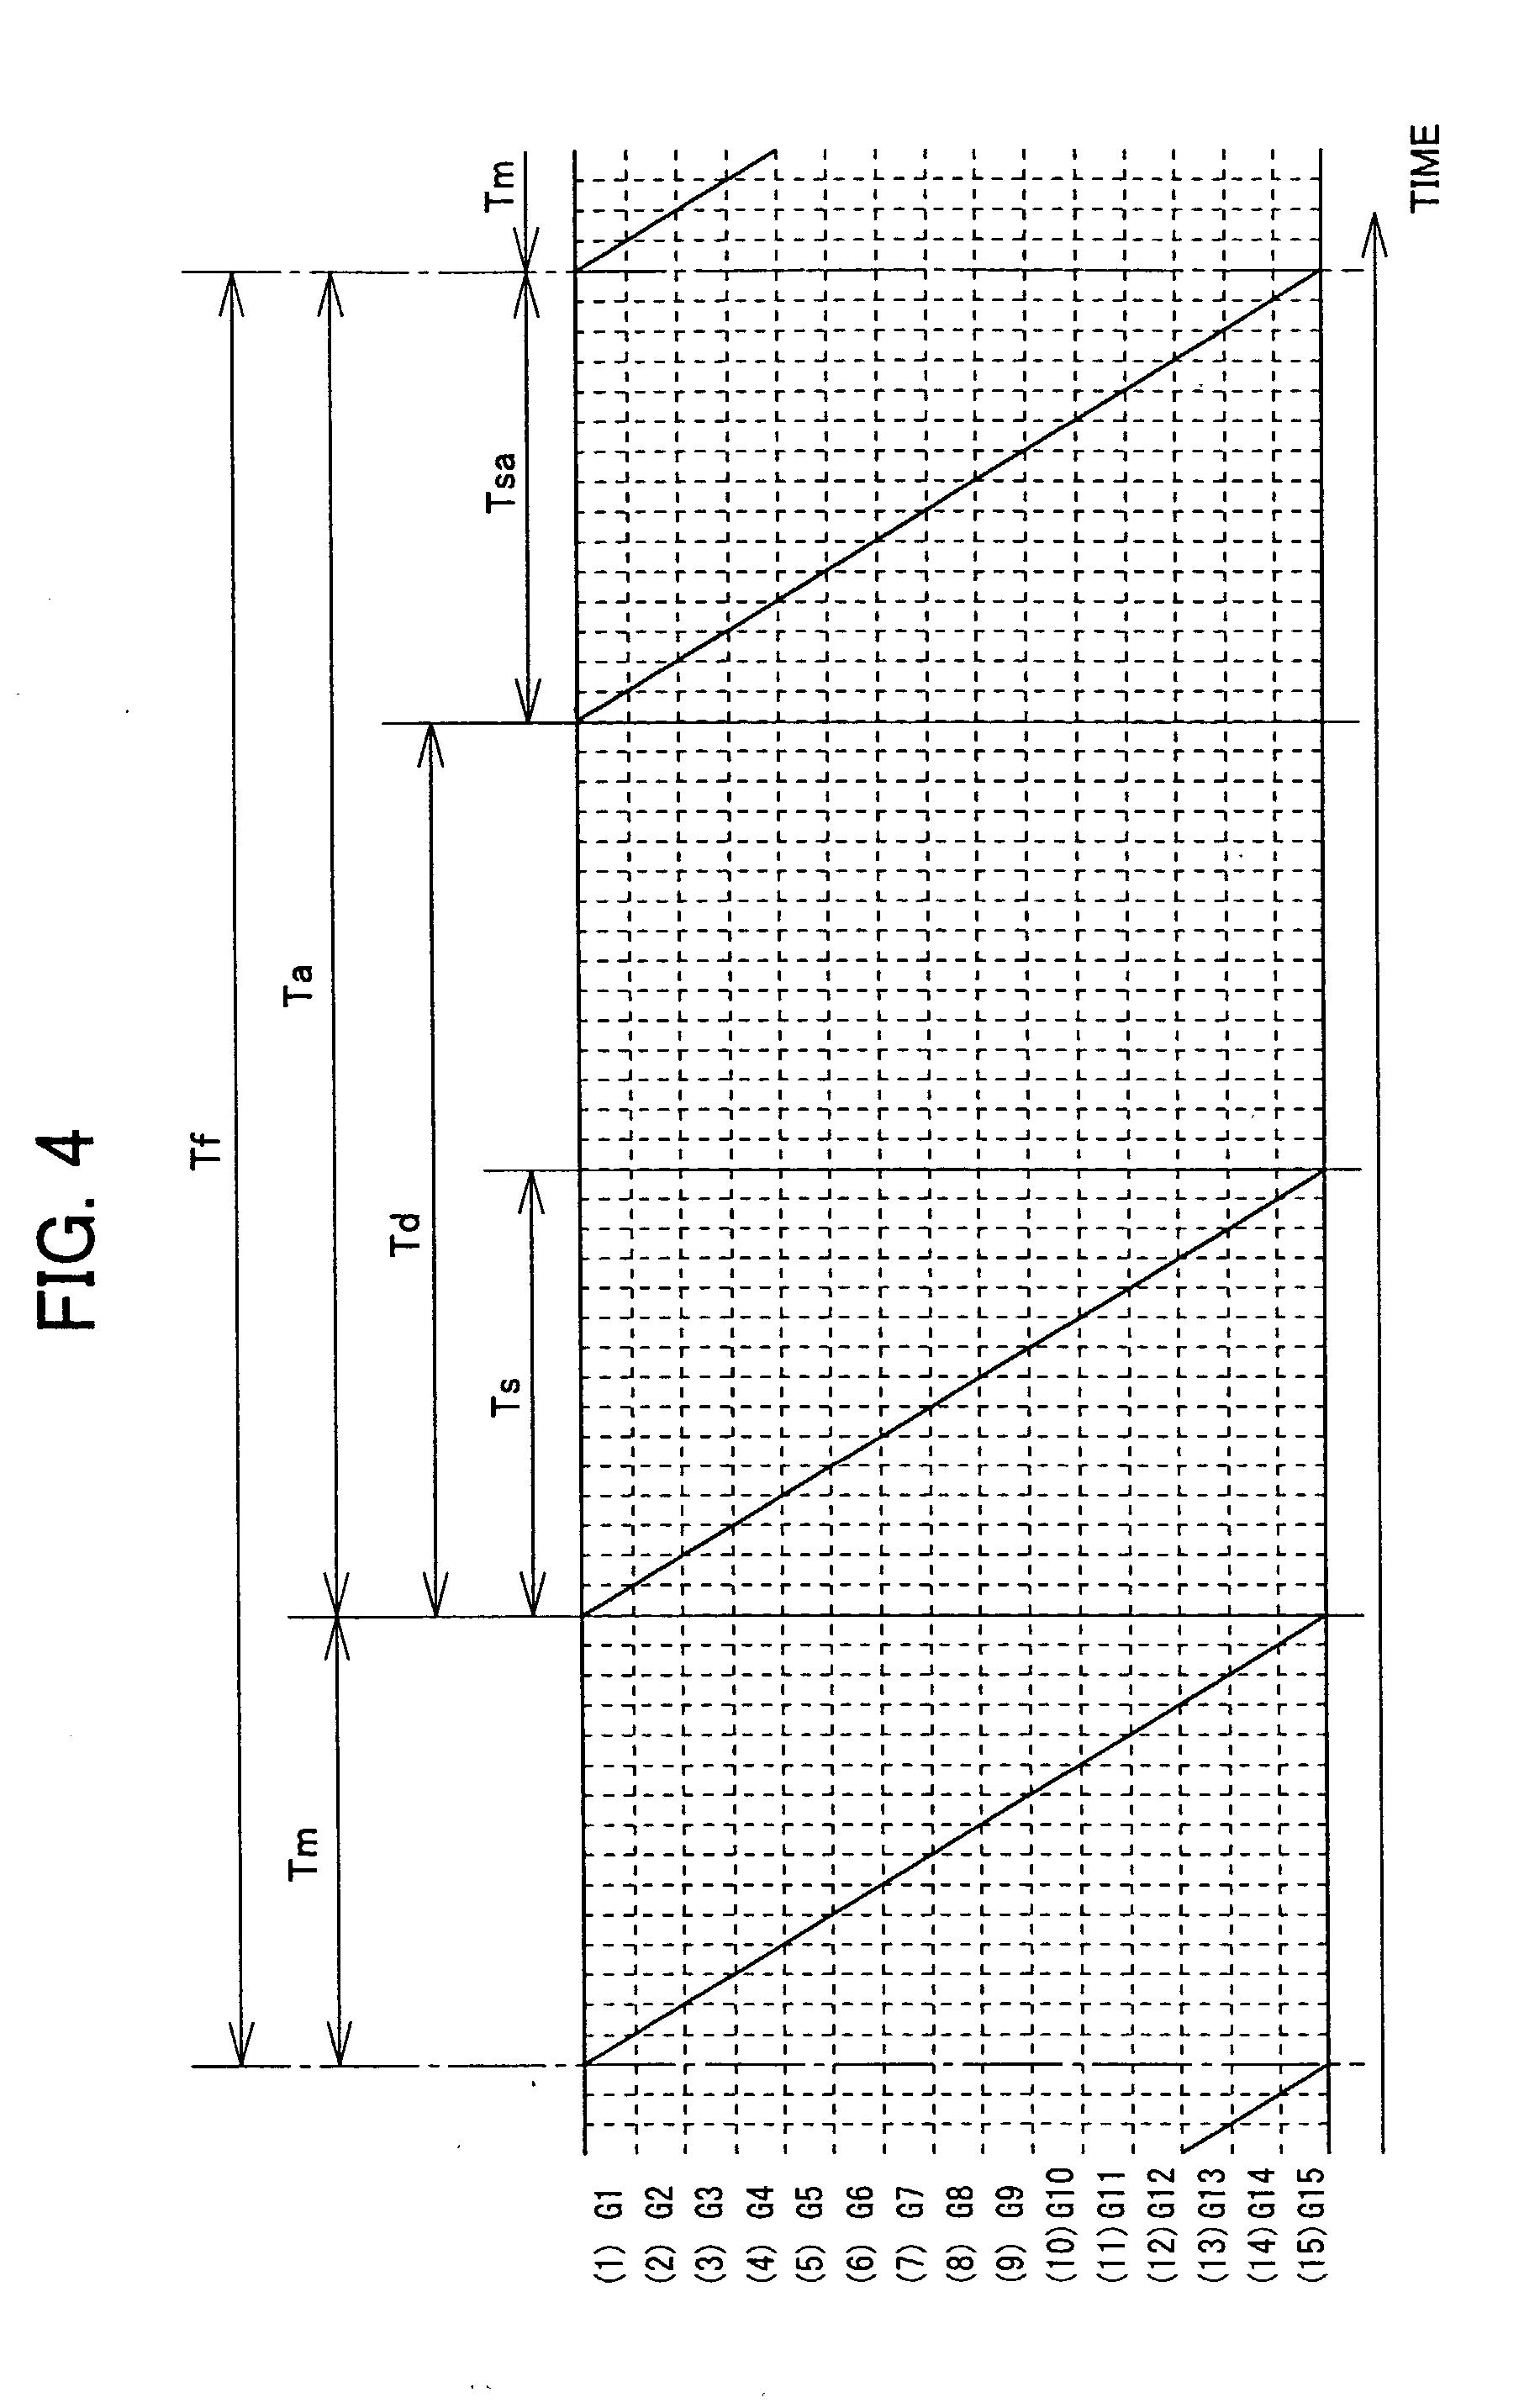 Patent Us20030011314 Display Apparatus And Method Google Toshiba G7 Wiring Diagram Drawing